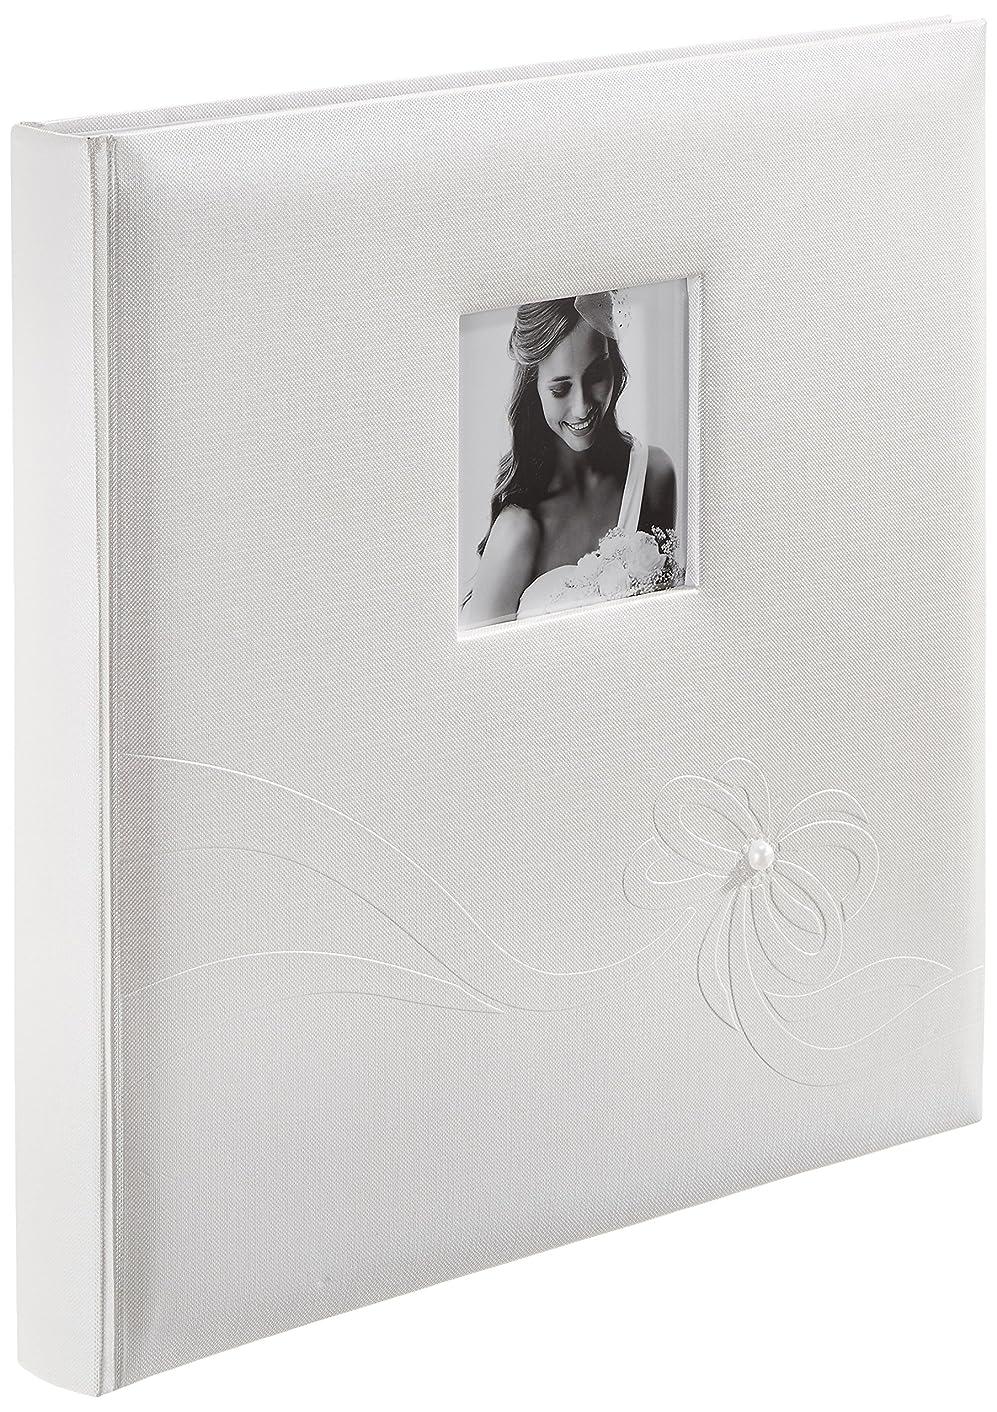 Zep Ostuni Blue 7.5x5 Slip in Photo Album - 200 Photos Overall Size 11.25x9.5